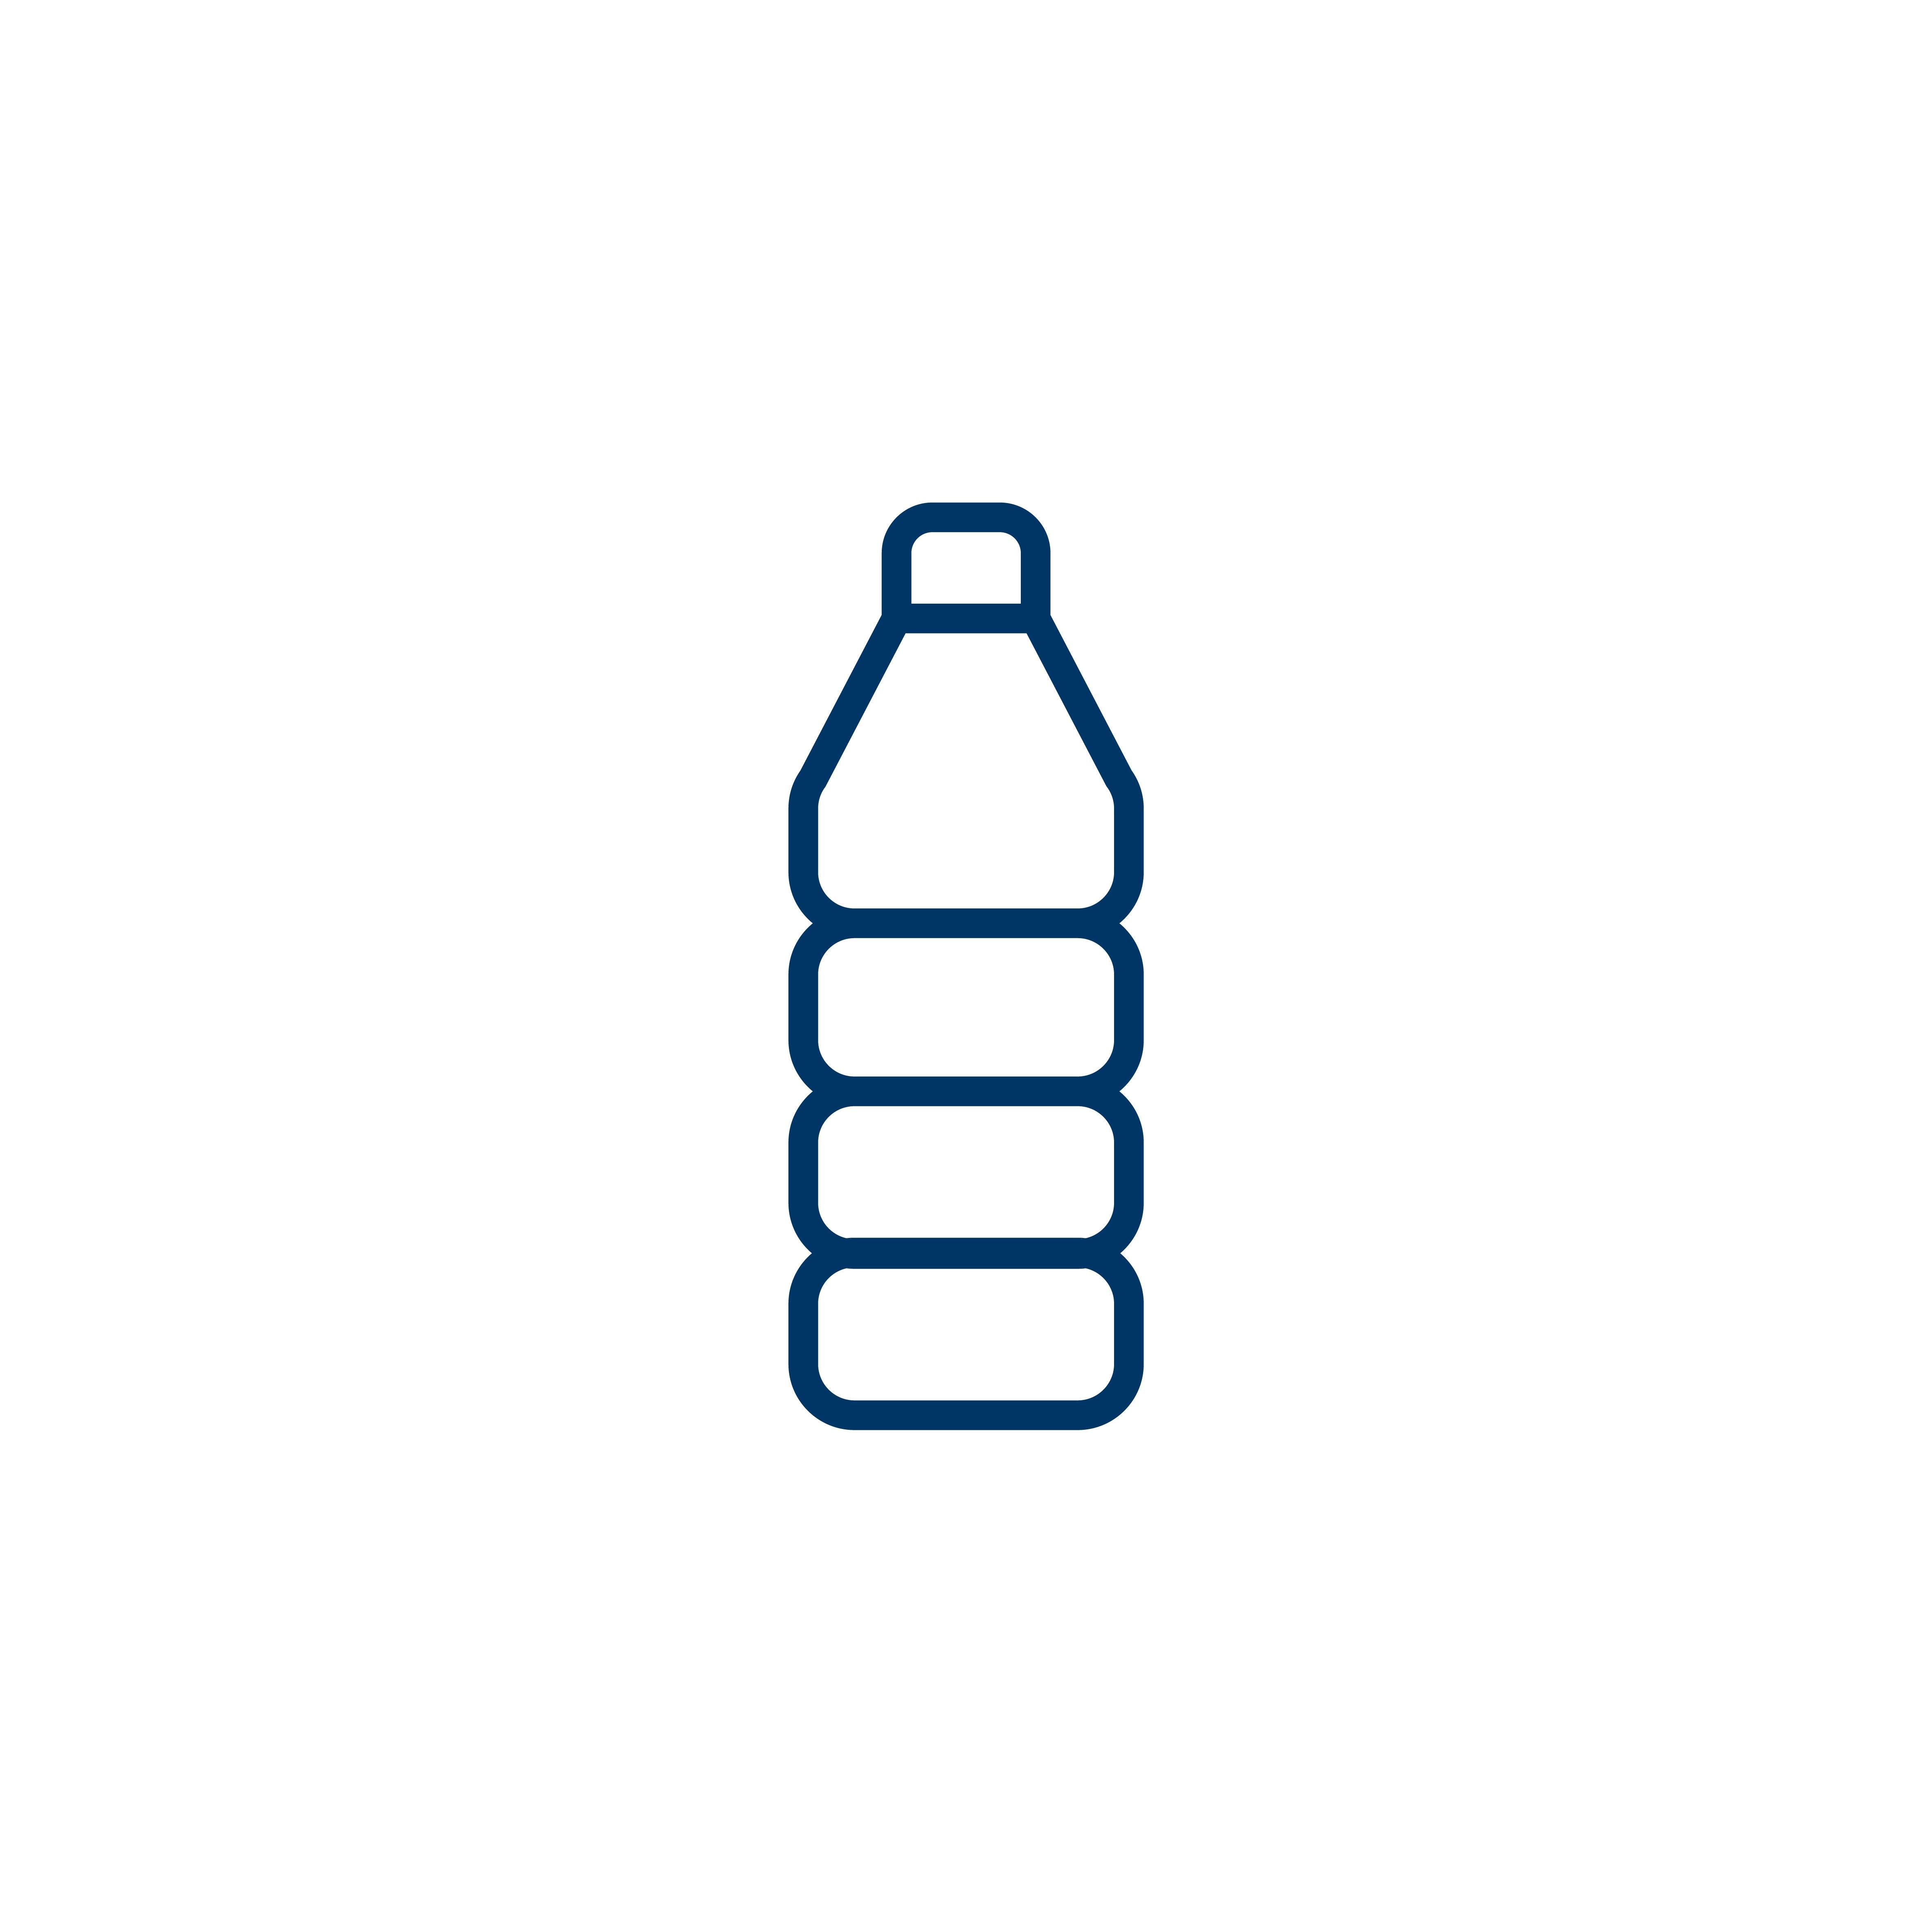 099fe56b21 Plastic Water Bottle Drawing   Free download best Plastic Water ...